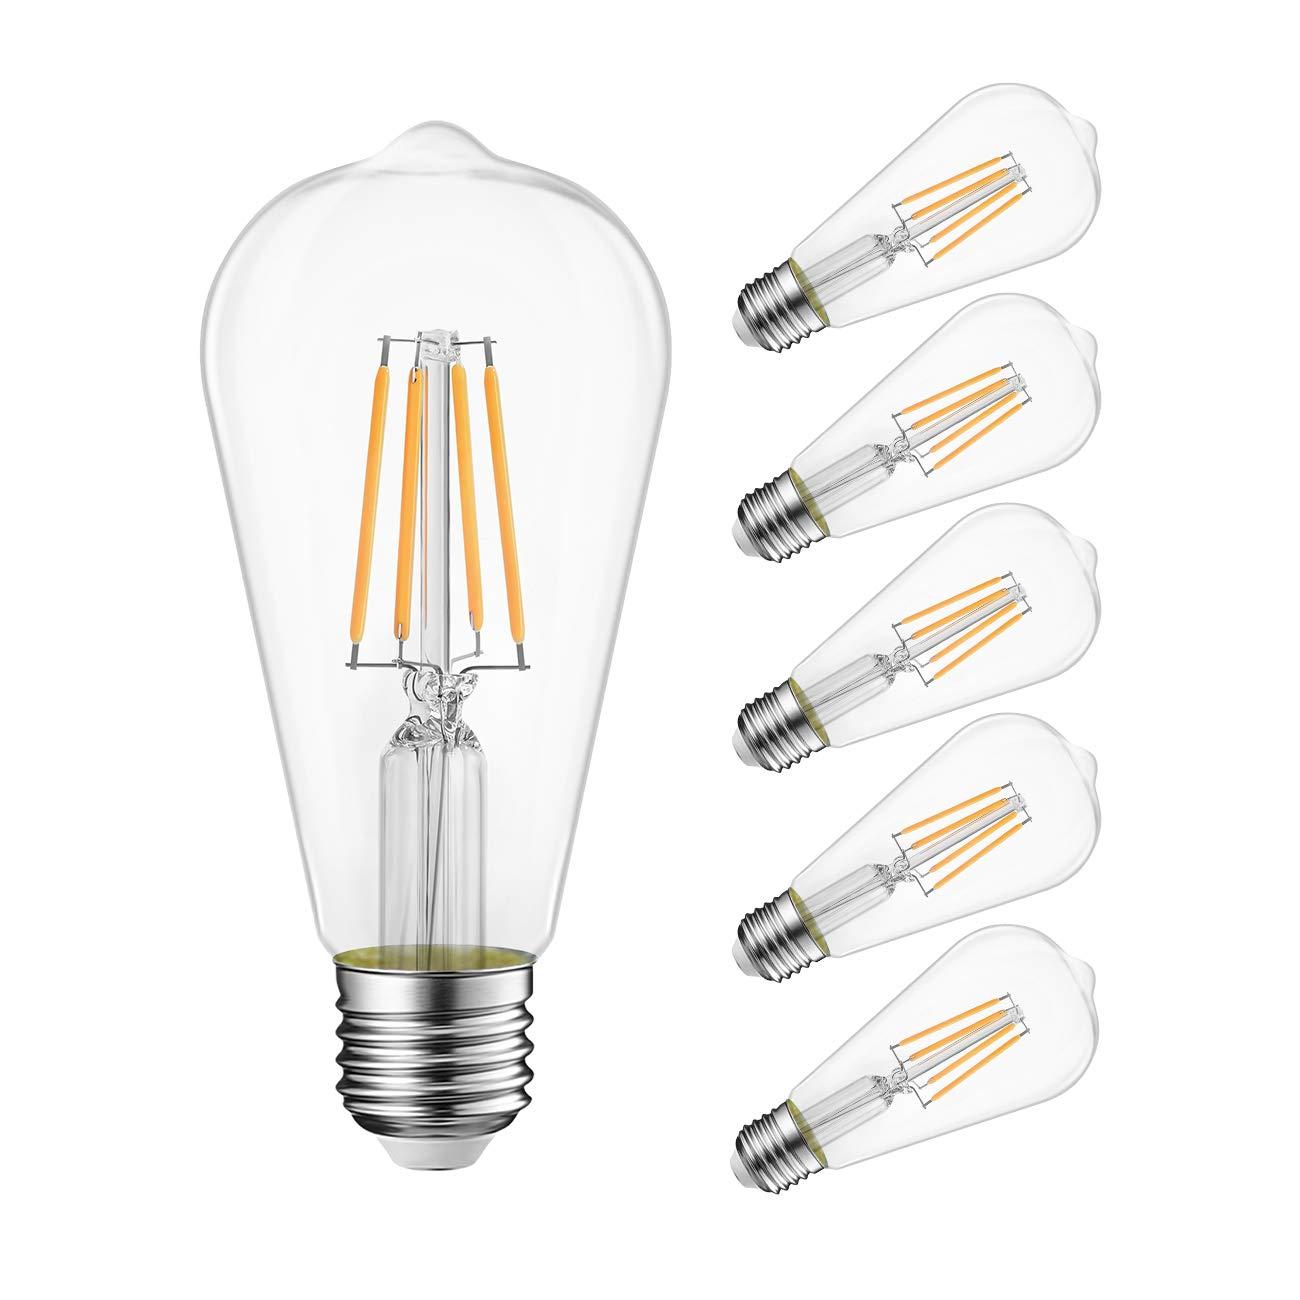 LVWIT ST21 LED Filament Bulb 8W(60 Watt Equivalent) Dimmable 3000K Soft White Vintage Edison Light Bulb E26 Medium Base (6-Pack) (8W- Soft White)